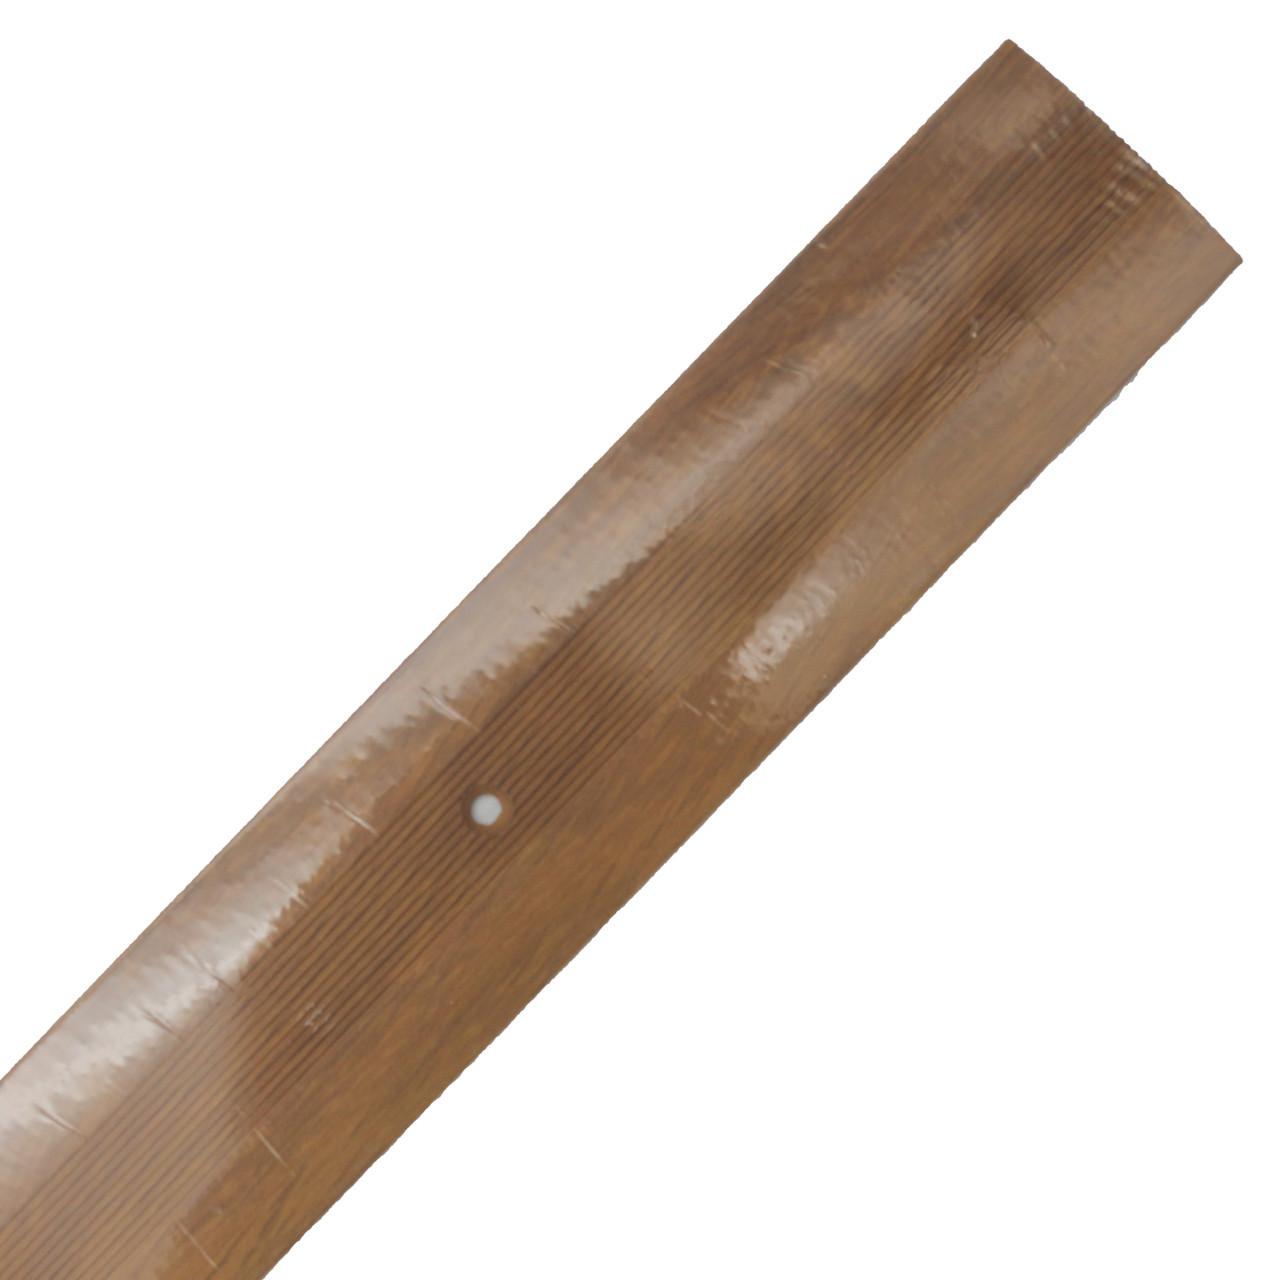 Профіль ал. АП 012 дуб шевруд 1,8 м